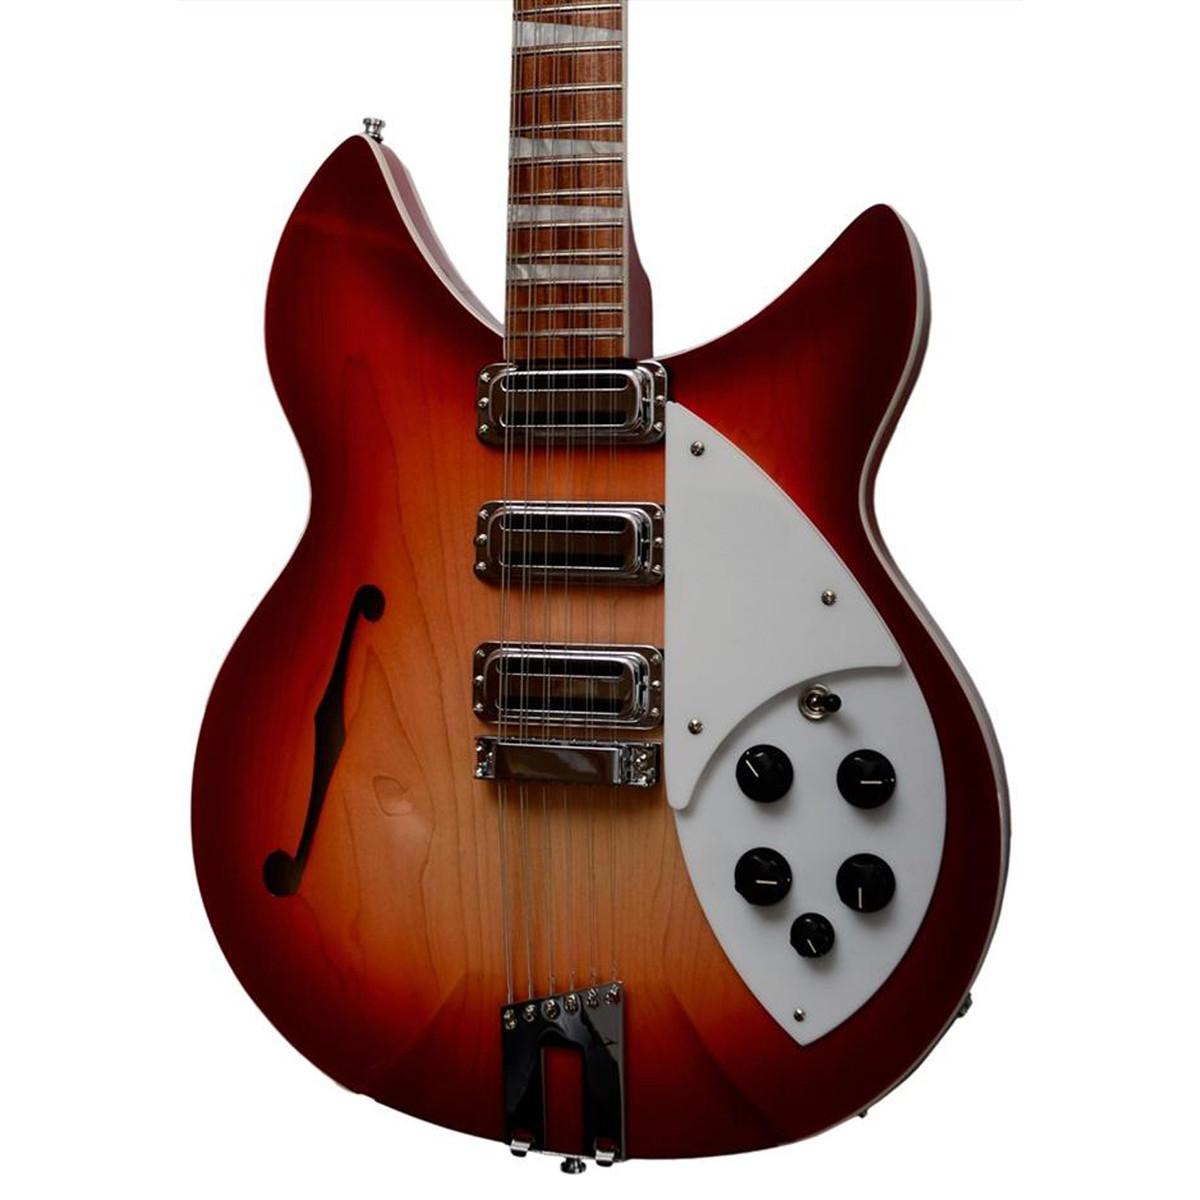 rickenbacker 1993 plus 12 string electric guitar fireglo at. Black Bedroom Furniture Sets. Home Design Ideas